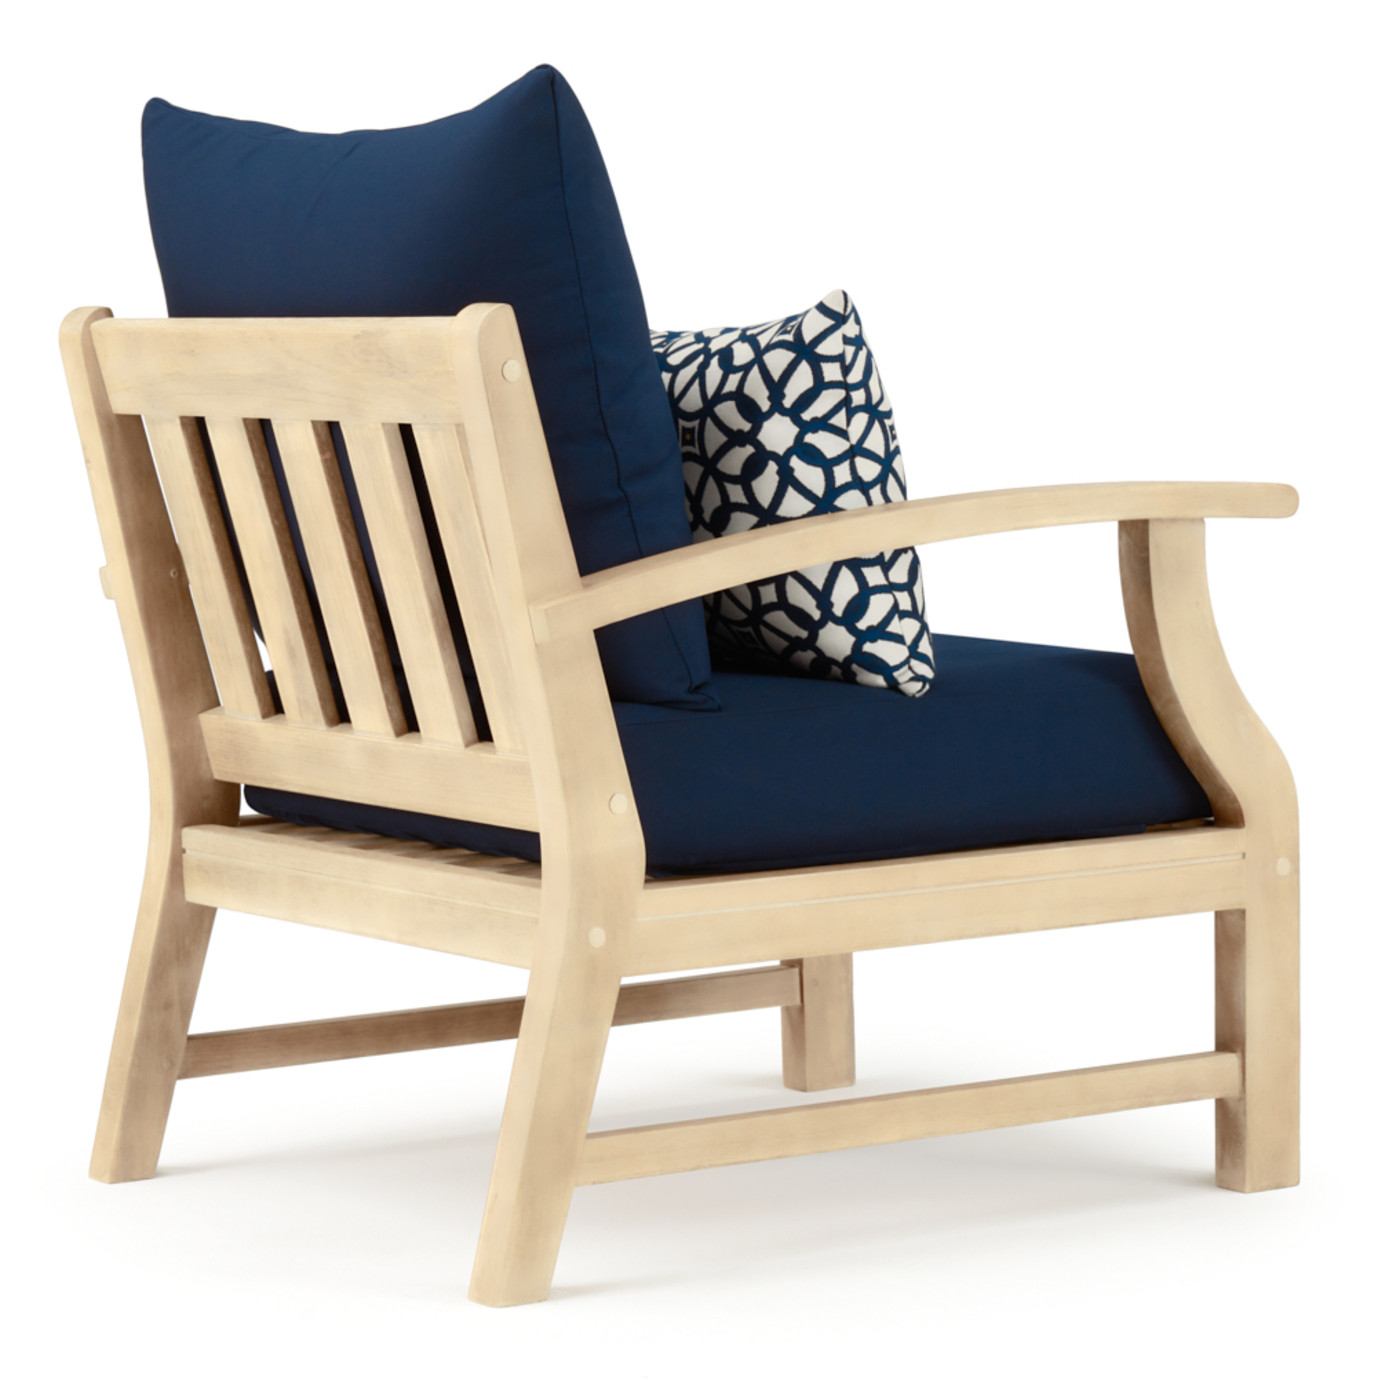 Kooper Club Chairs - Navy Blue